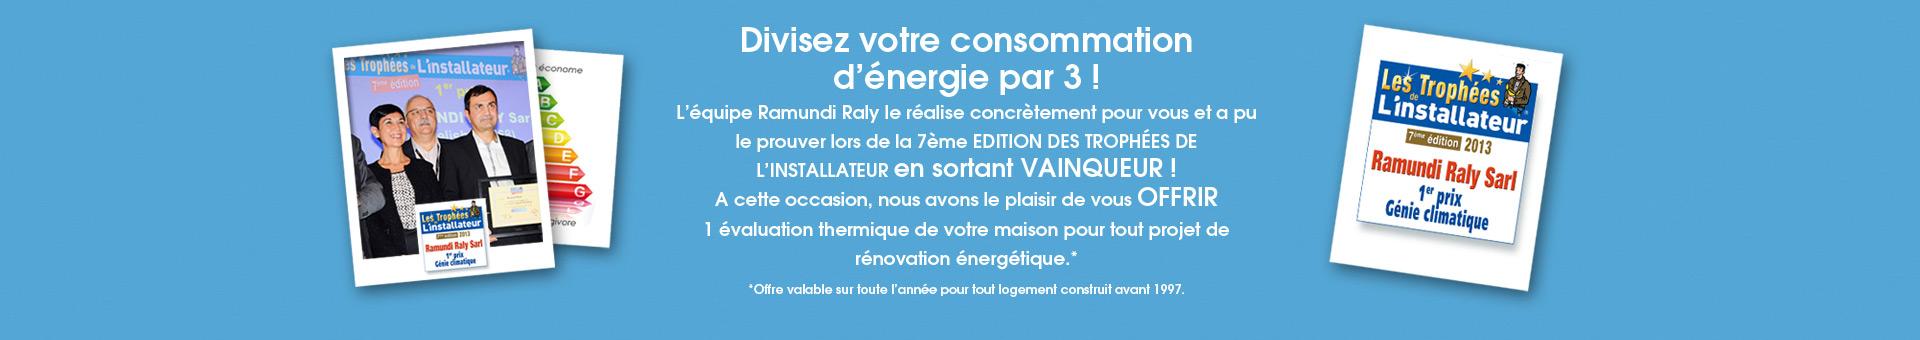 Reduire sa consommation d'énergie